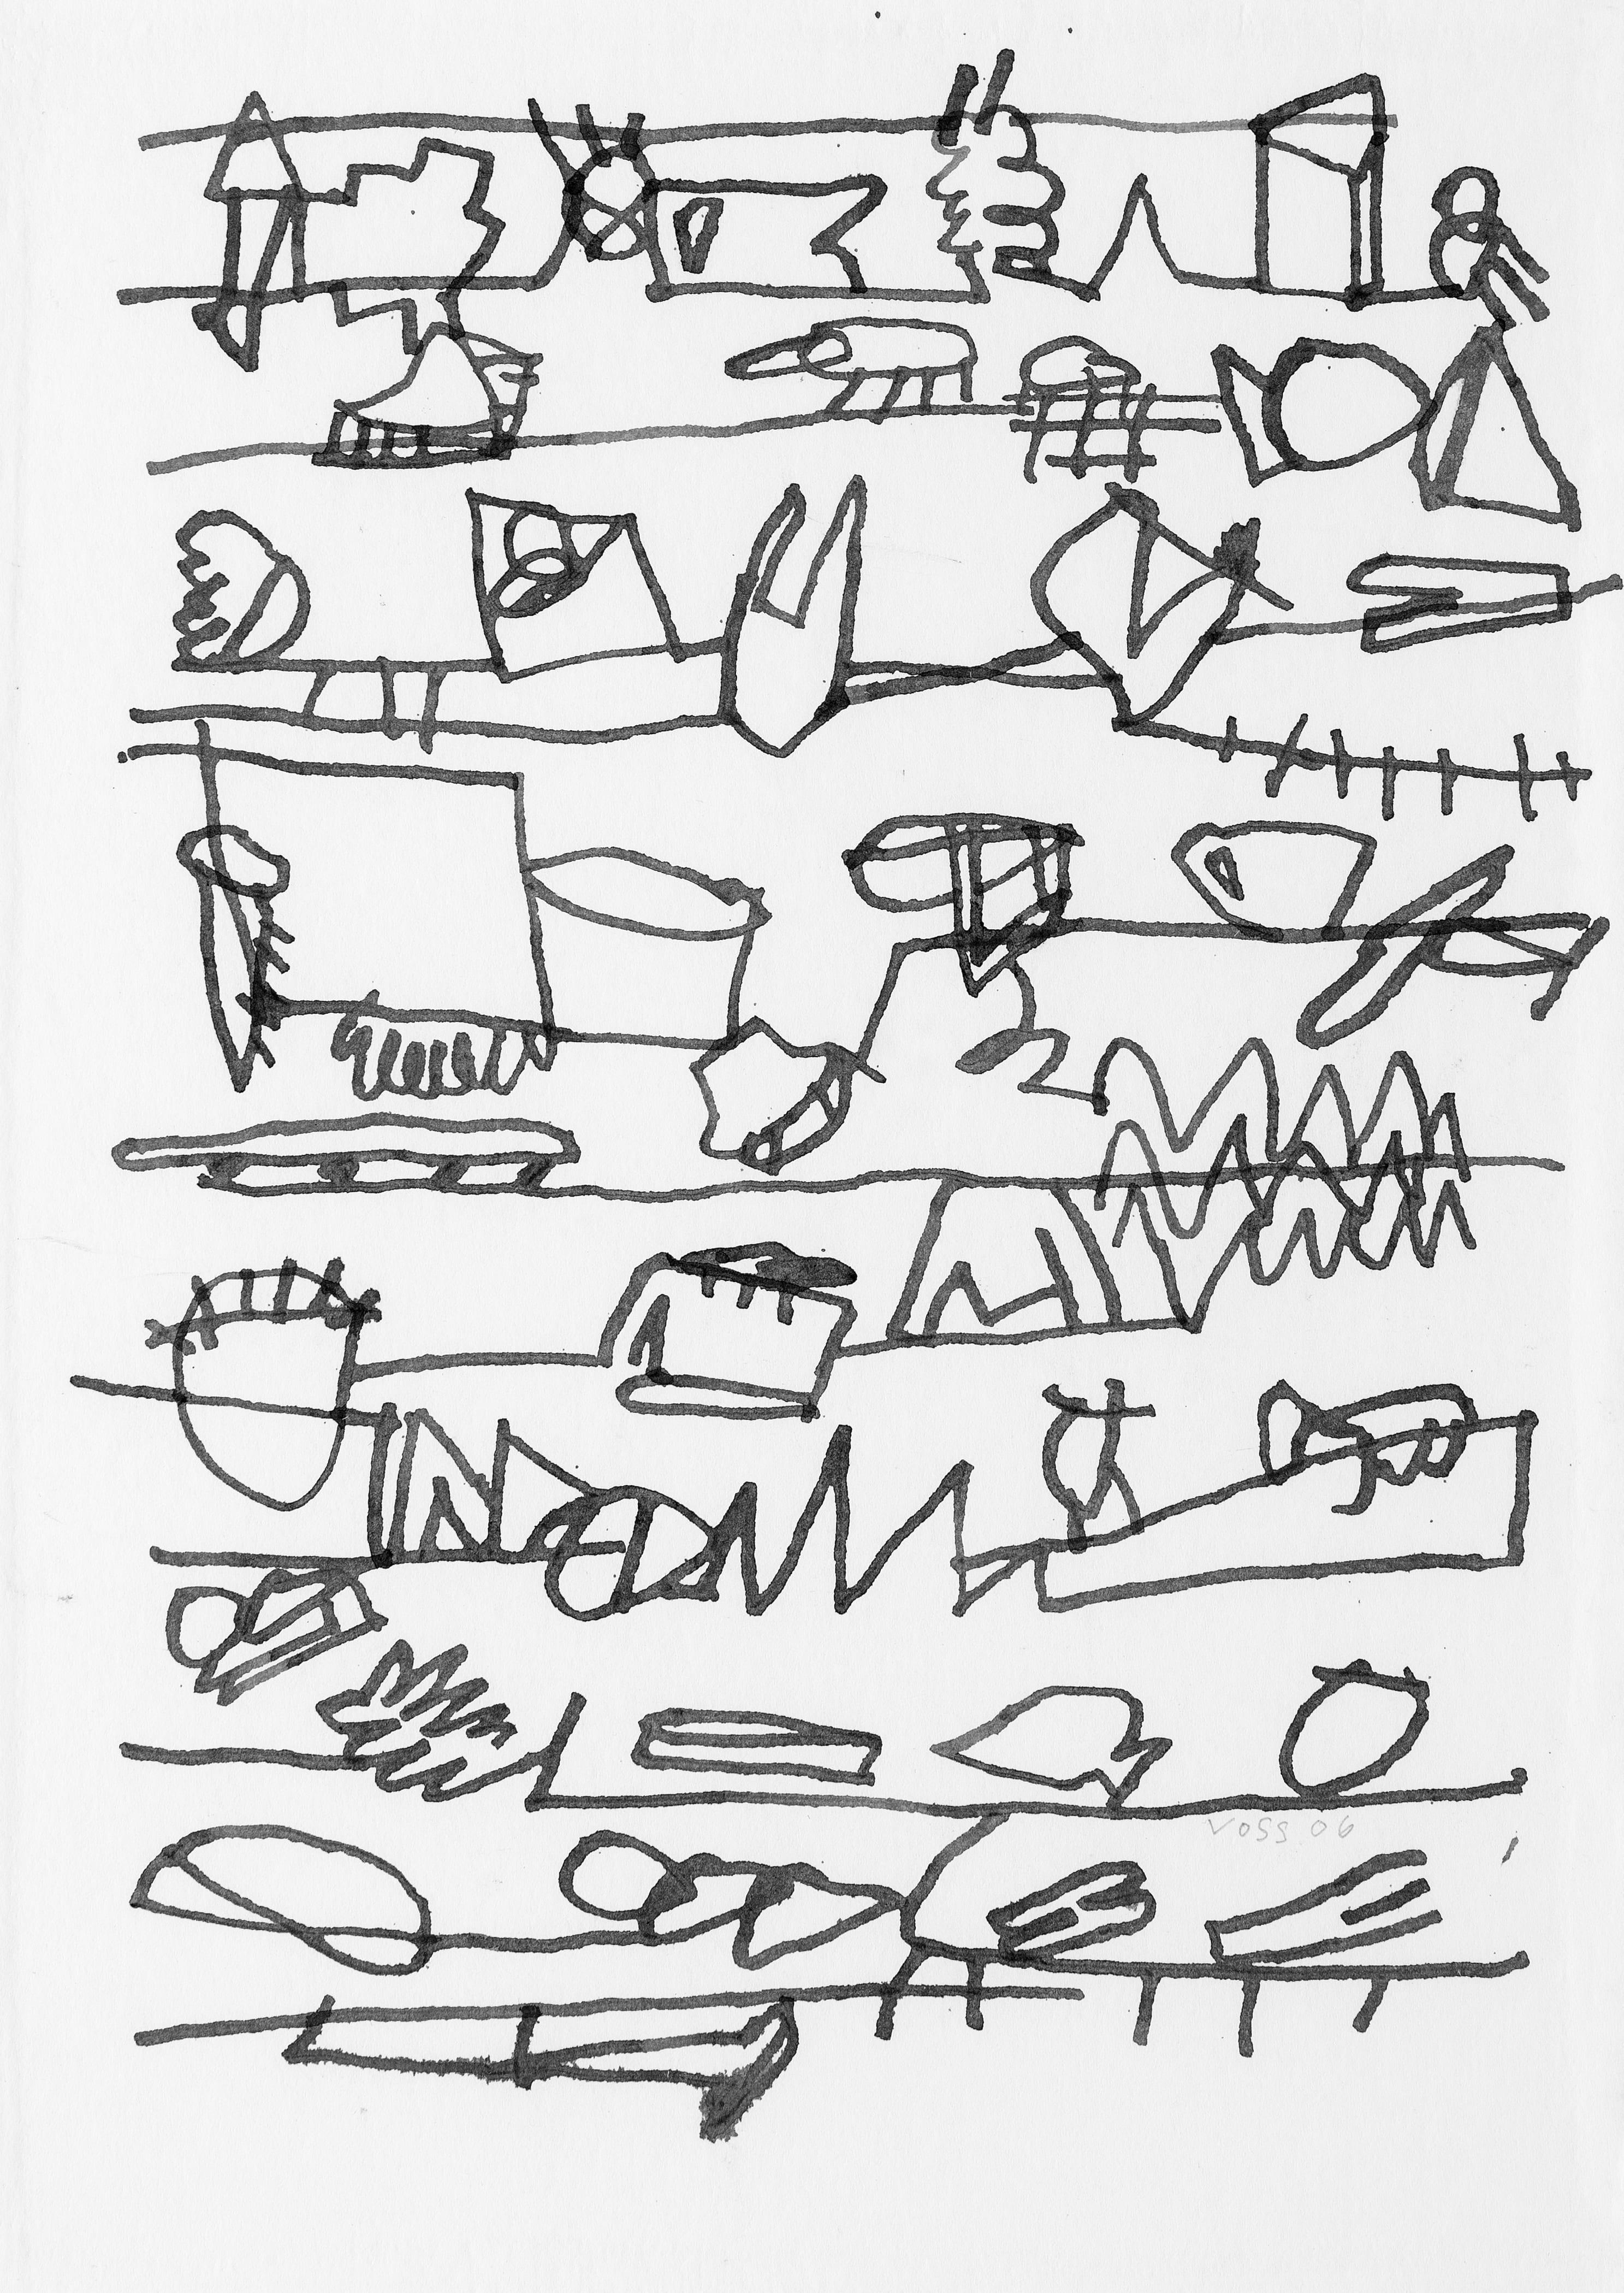 Jan Voss, Correspondance intime, 2006